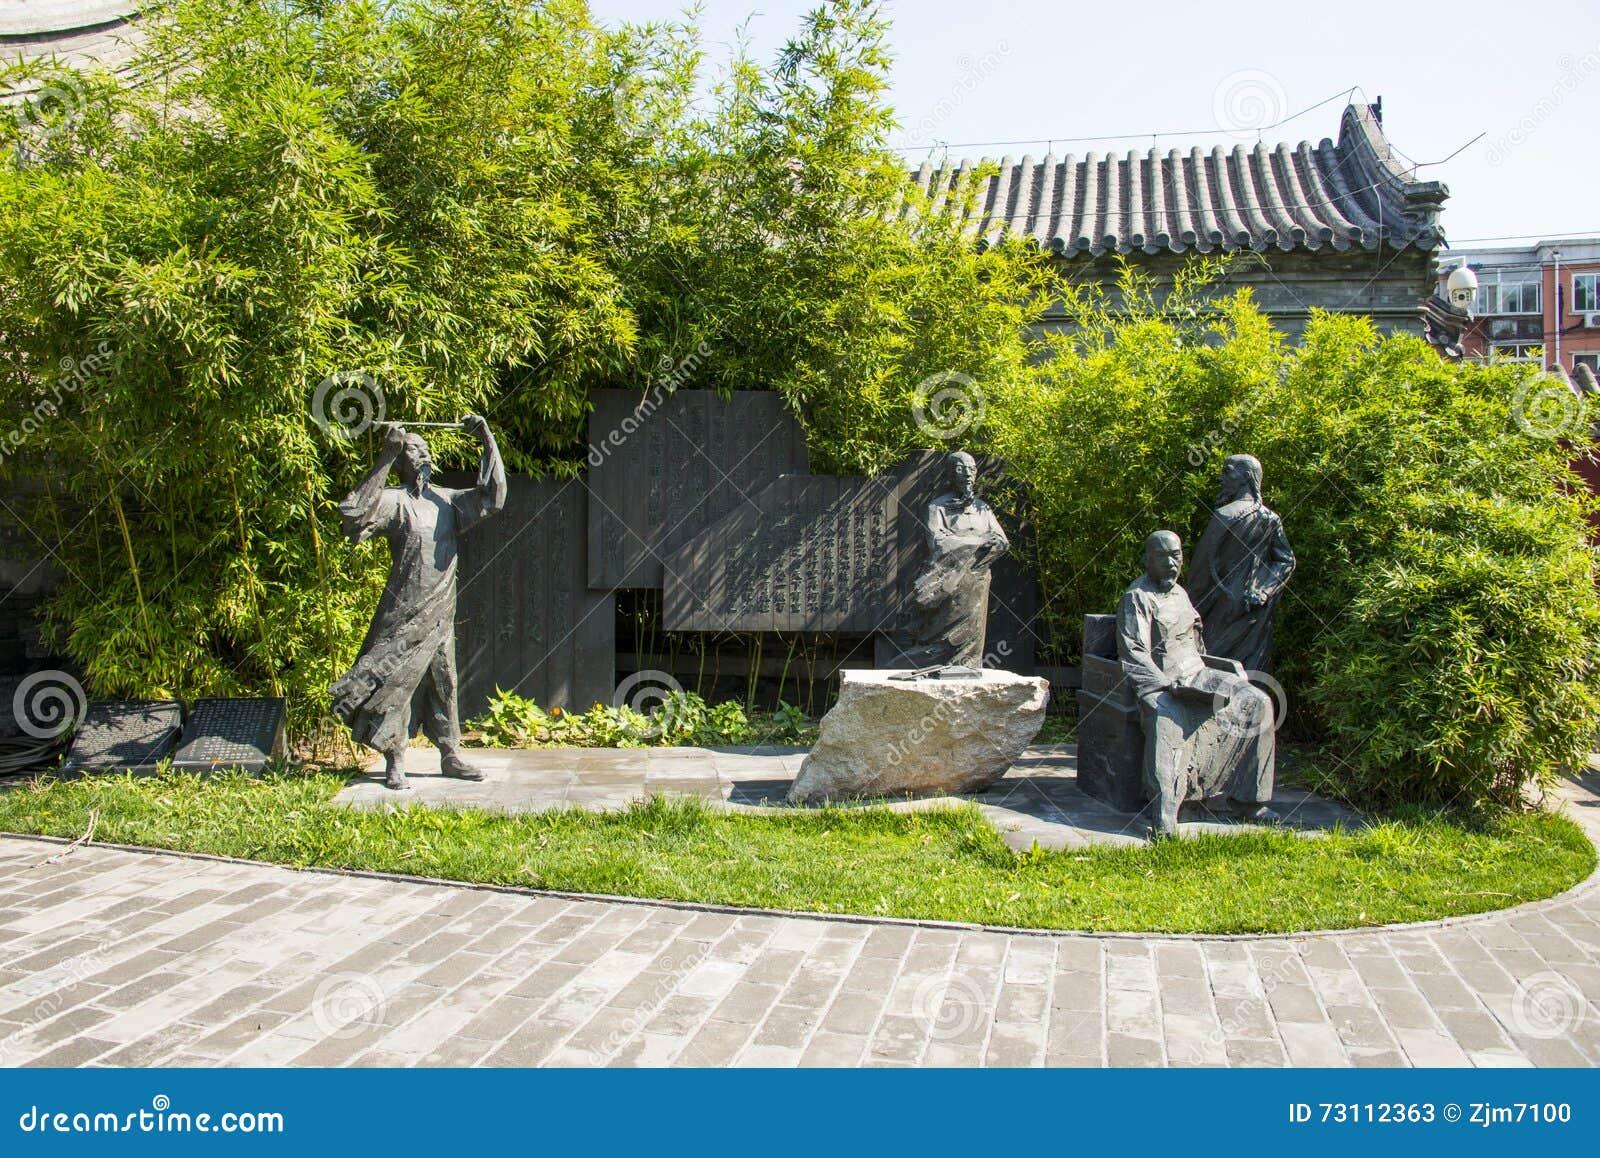 Asia China, Beijing, Xuan Nan Cultural Museum, Landscape sculpture,